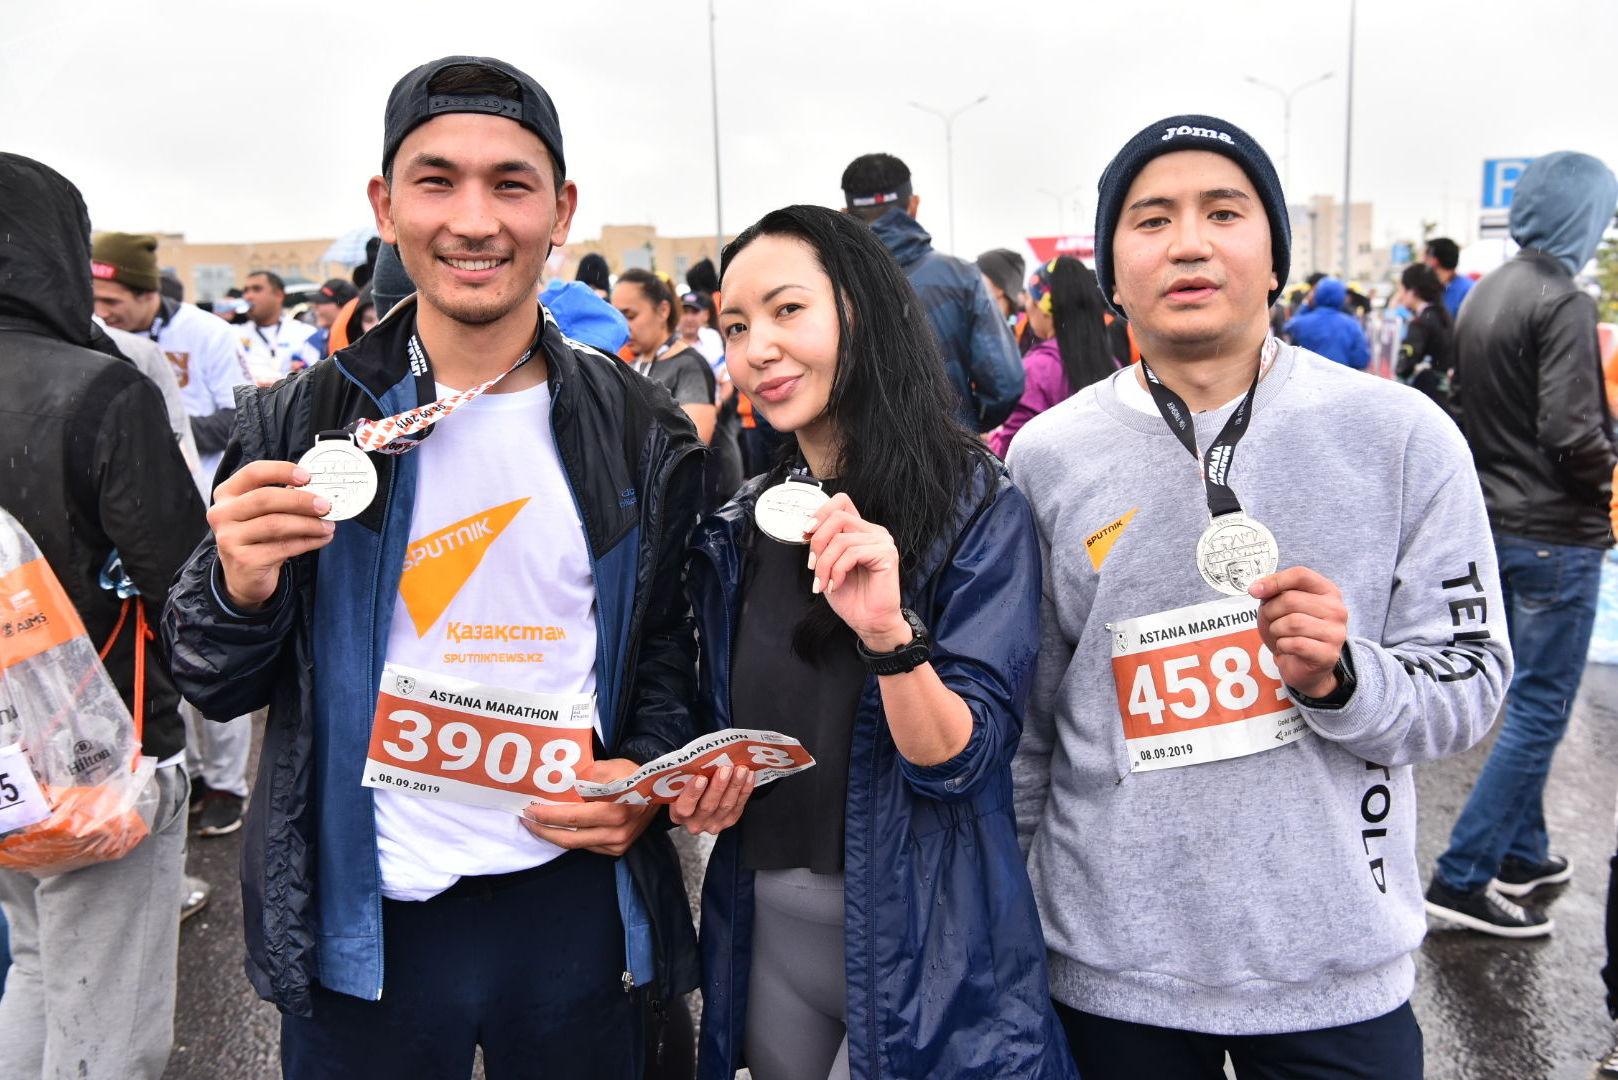 Сотрудники агентства Sputnik Казахстан Абзал Калиев, Юля Кузнецова и Даурен Ерболатов после преодоления марафона